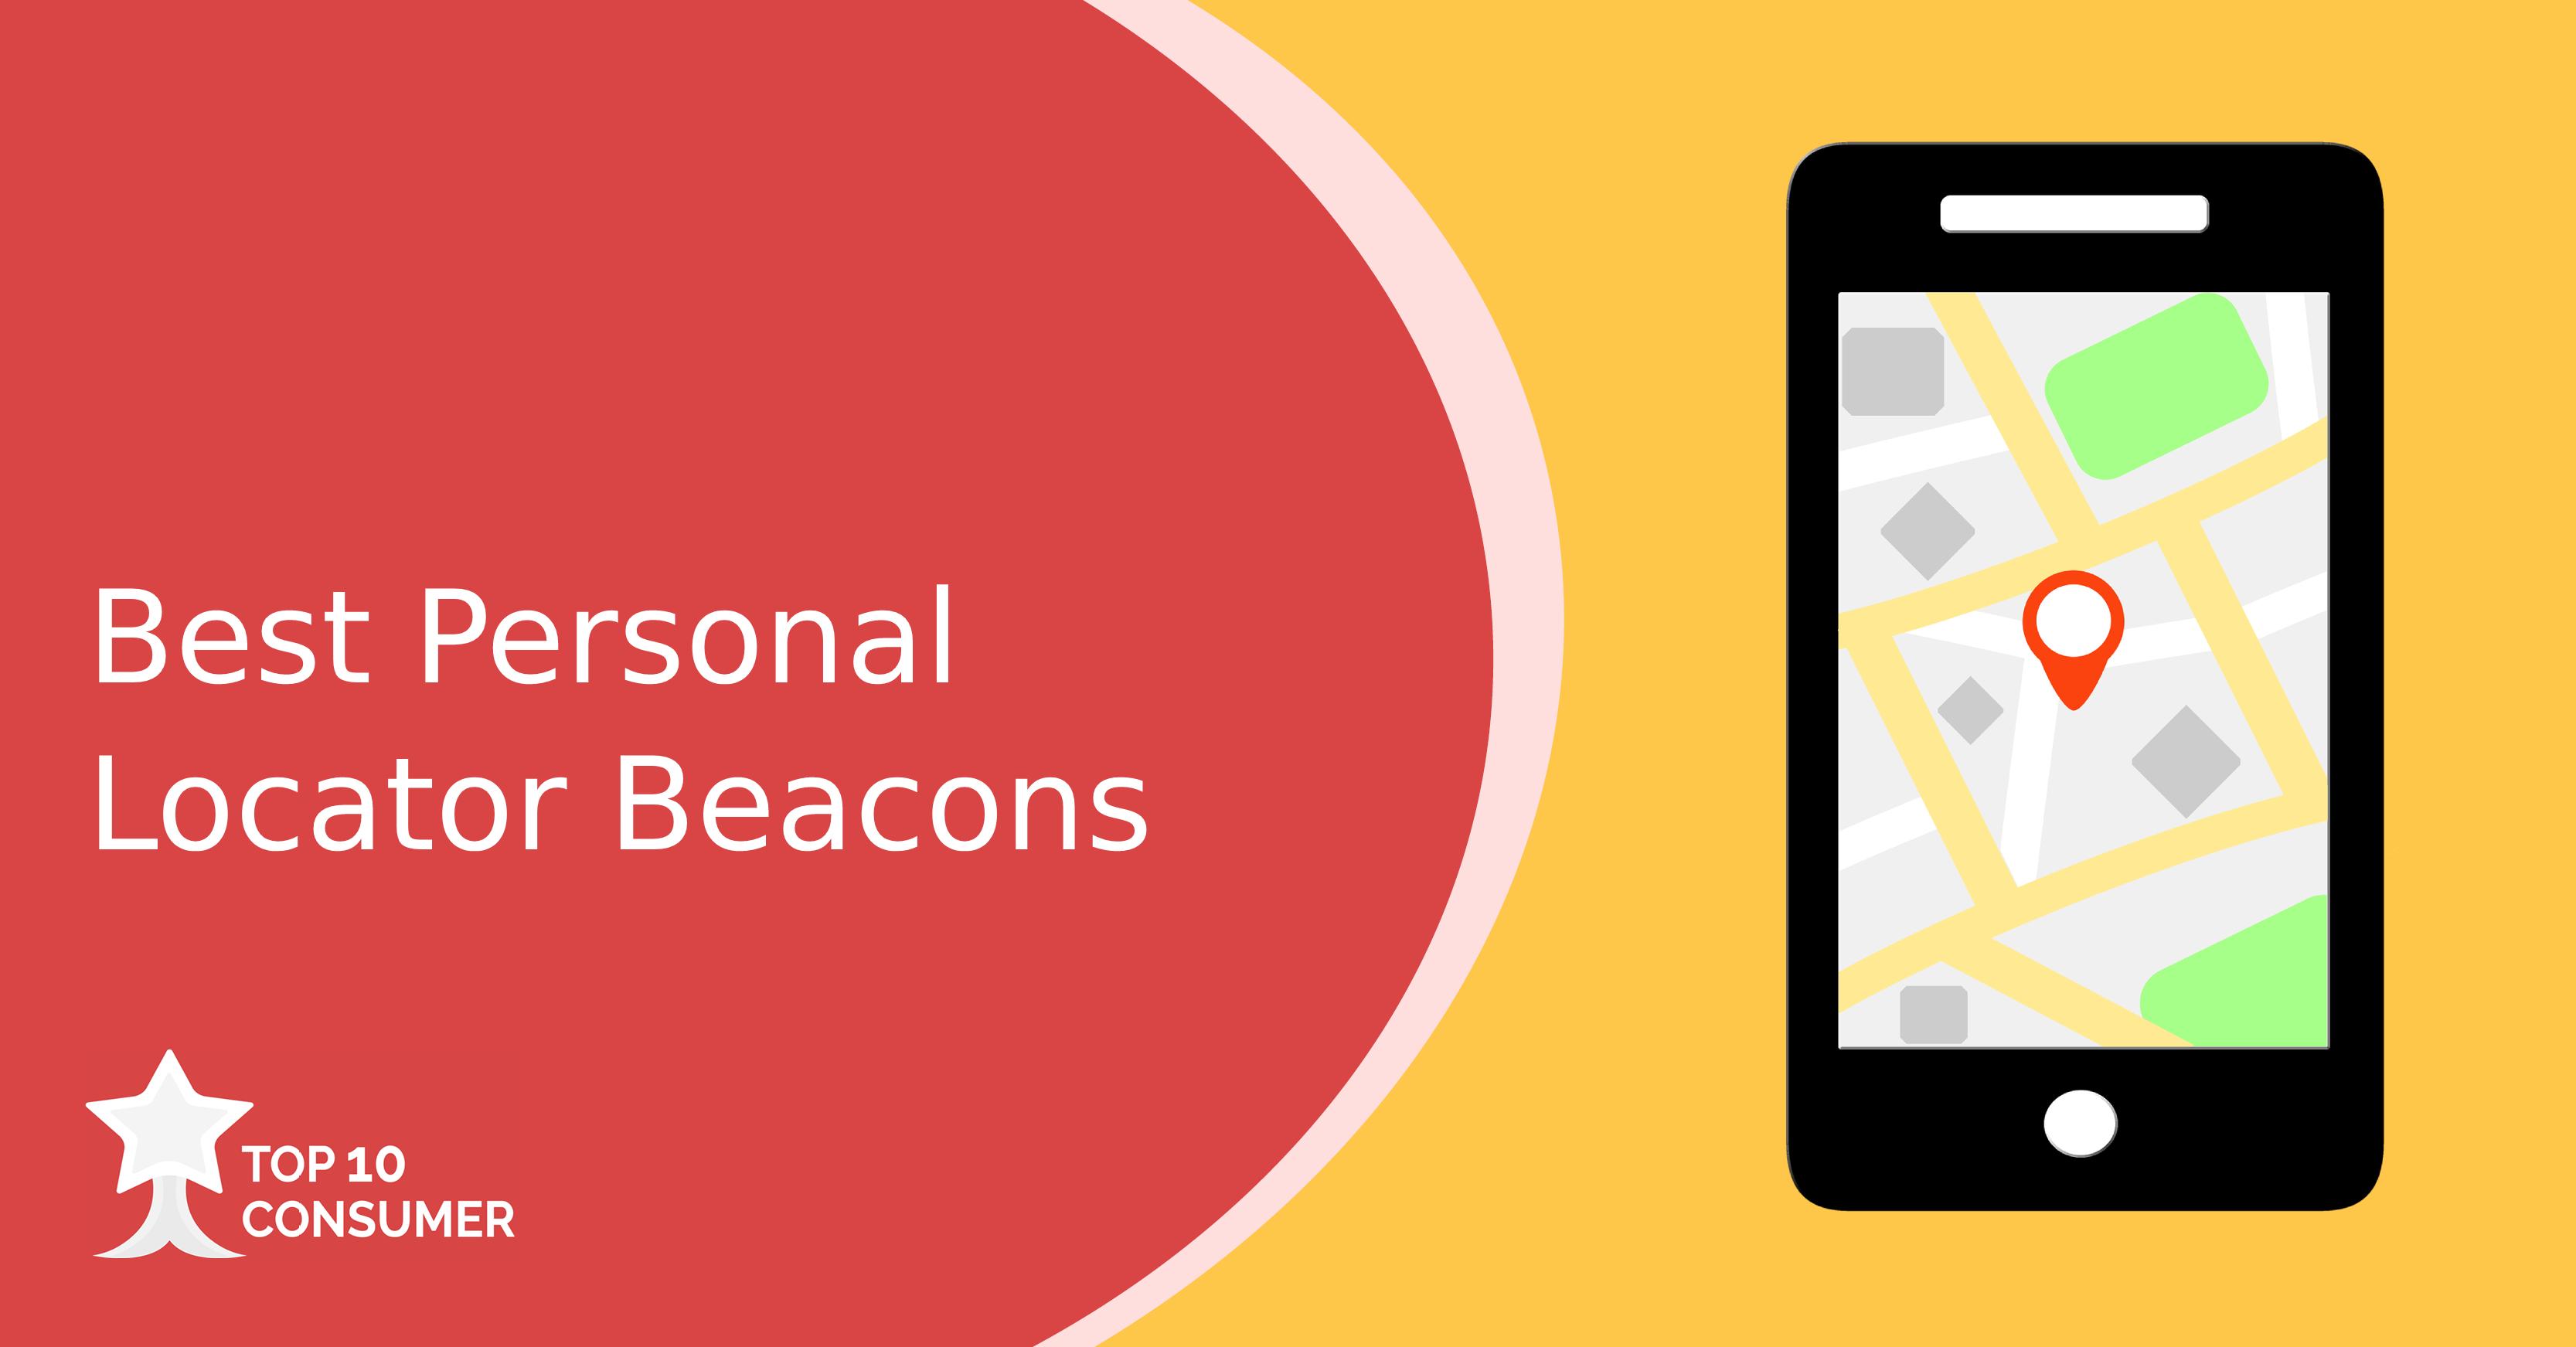 Best Personal Locator Beacons